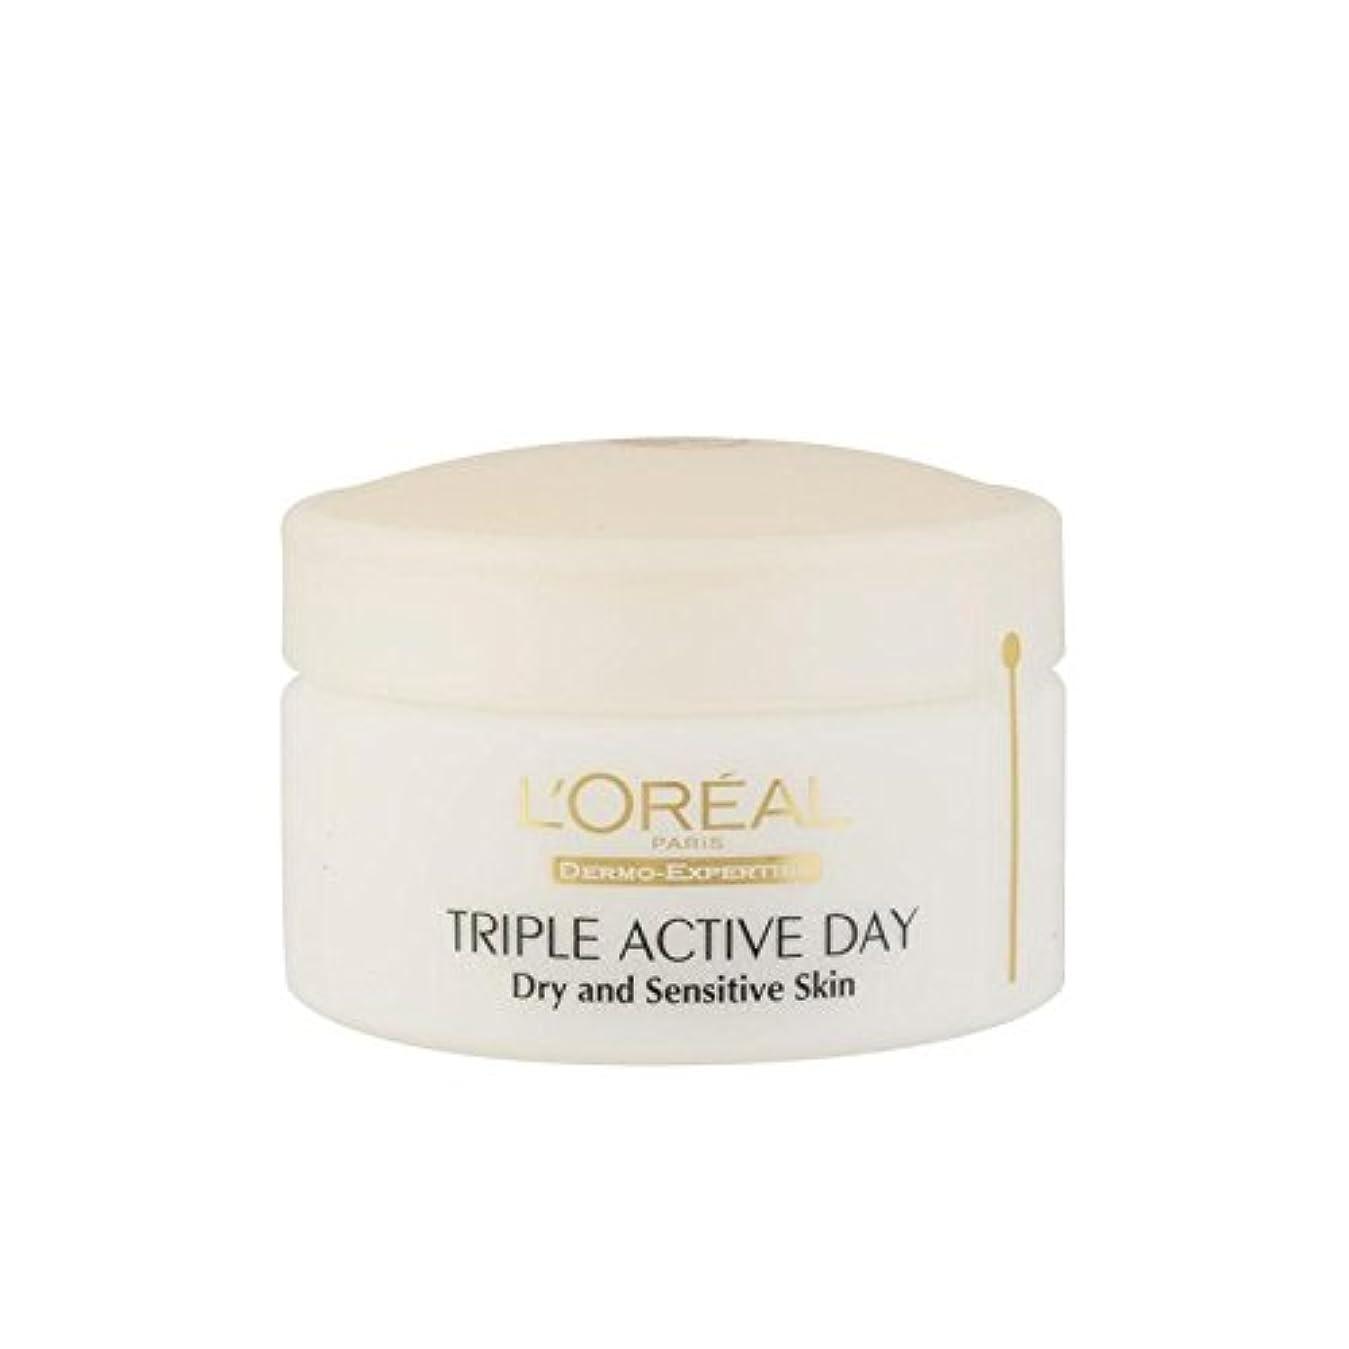 L'Oreal Paris Dermo Expertise Triple Active Day Multi-Protection Moisturiser - Dry/Sensitive Skin (50ml) - ロレアルパリ...